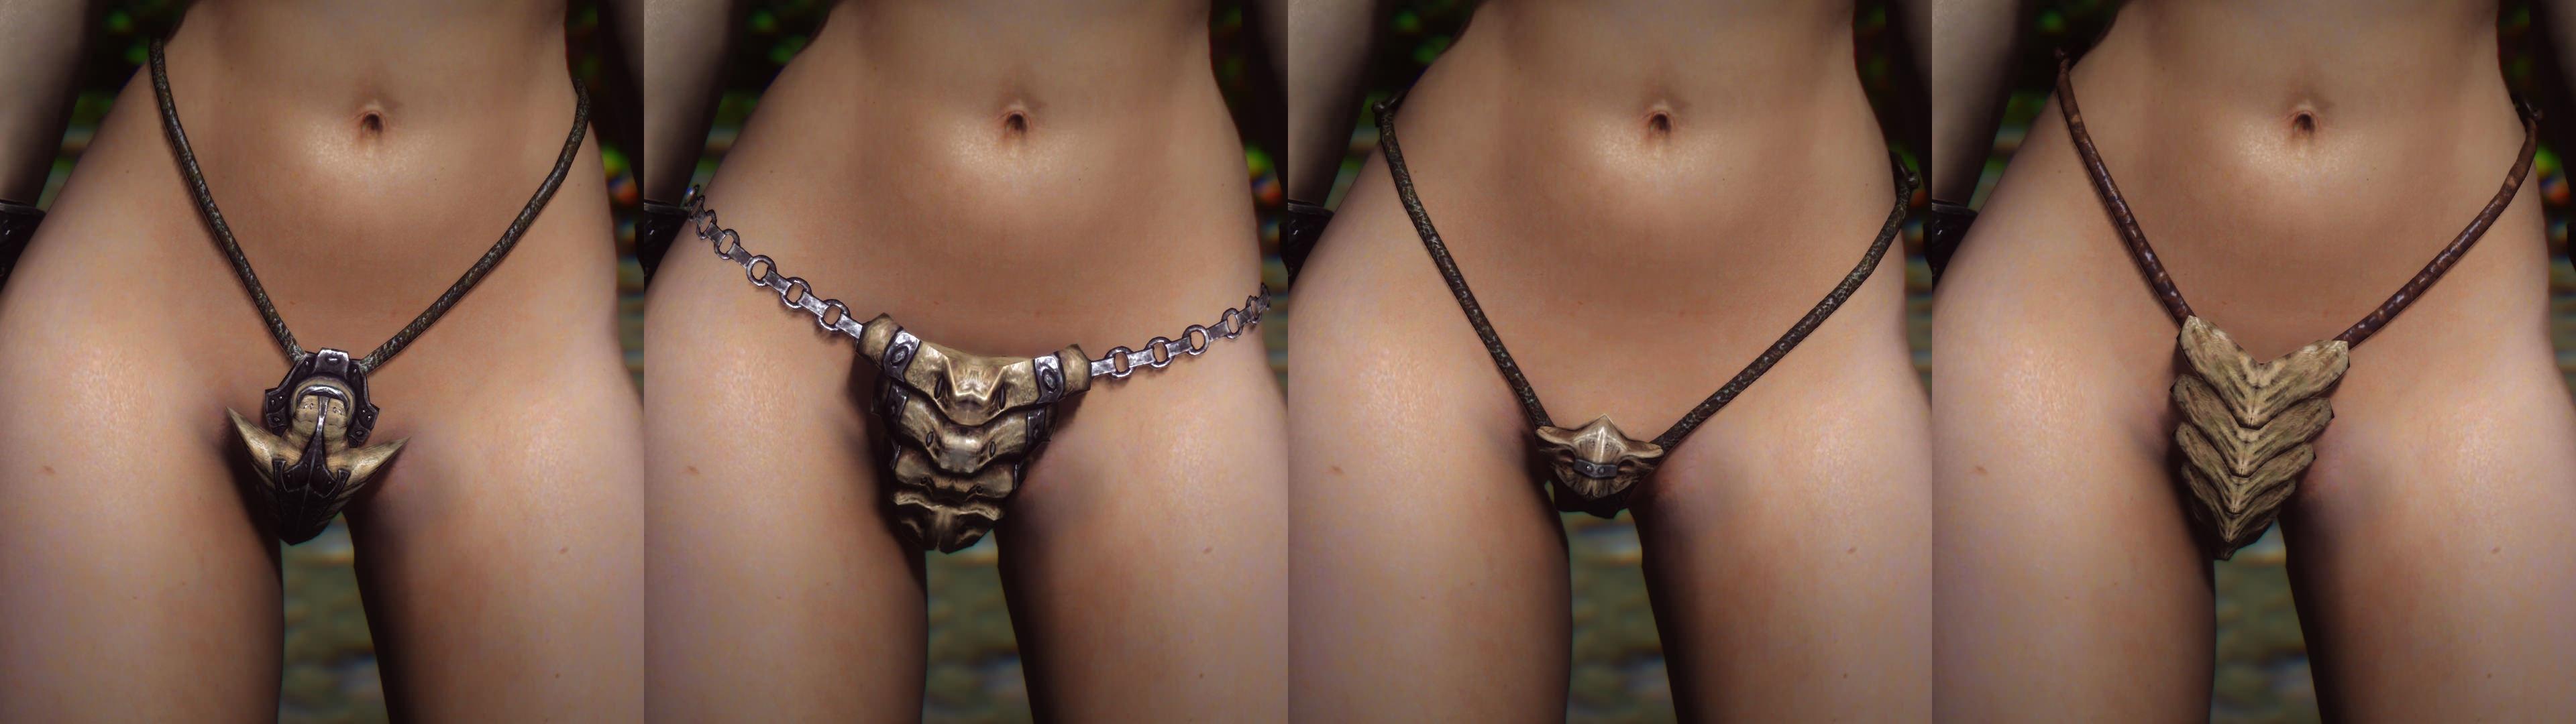 Dragon_Bone_Bikini_Armor_12.jpg